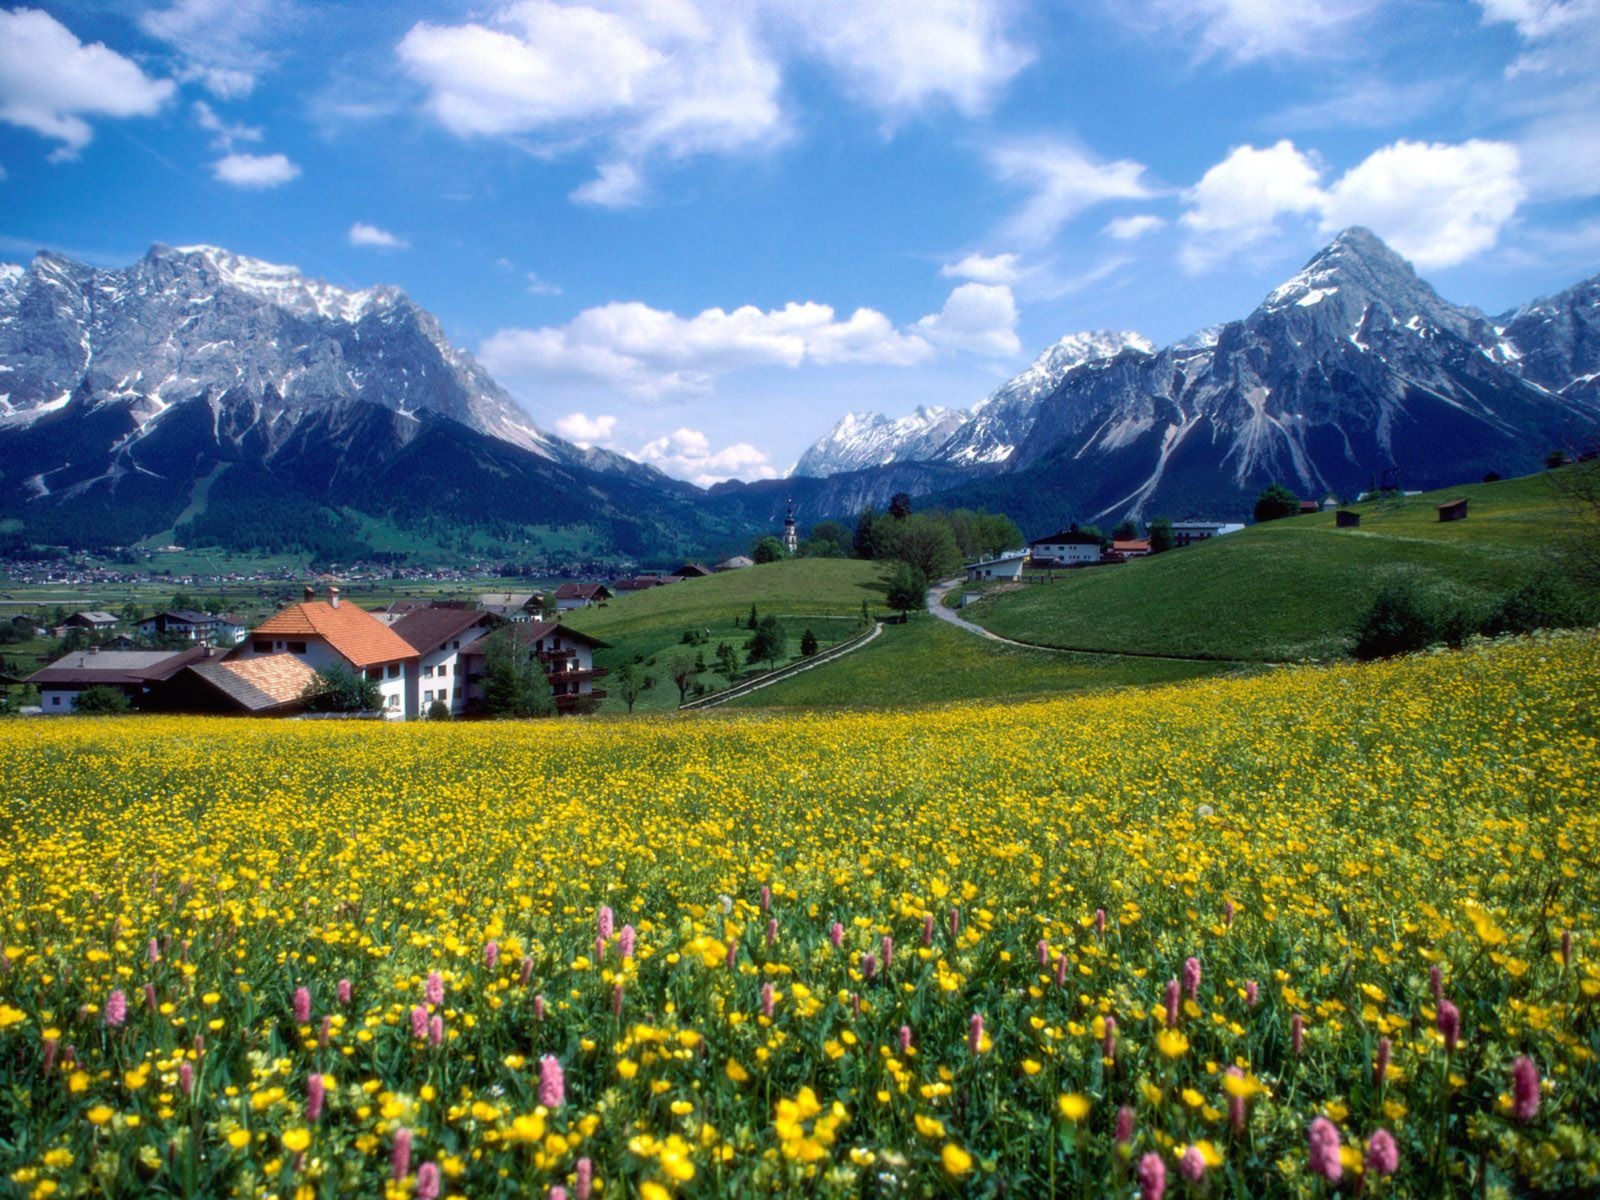 The Countryside Photography Photo Blog Countryside Splendor of 1600x1200